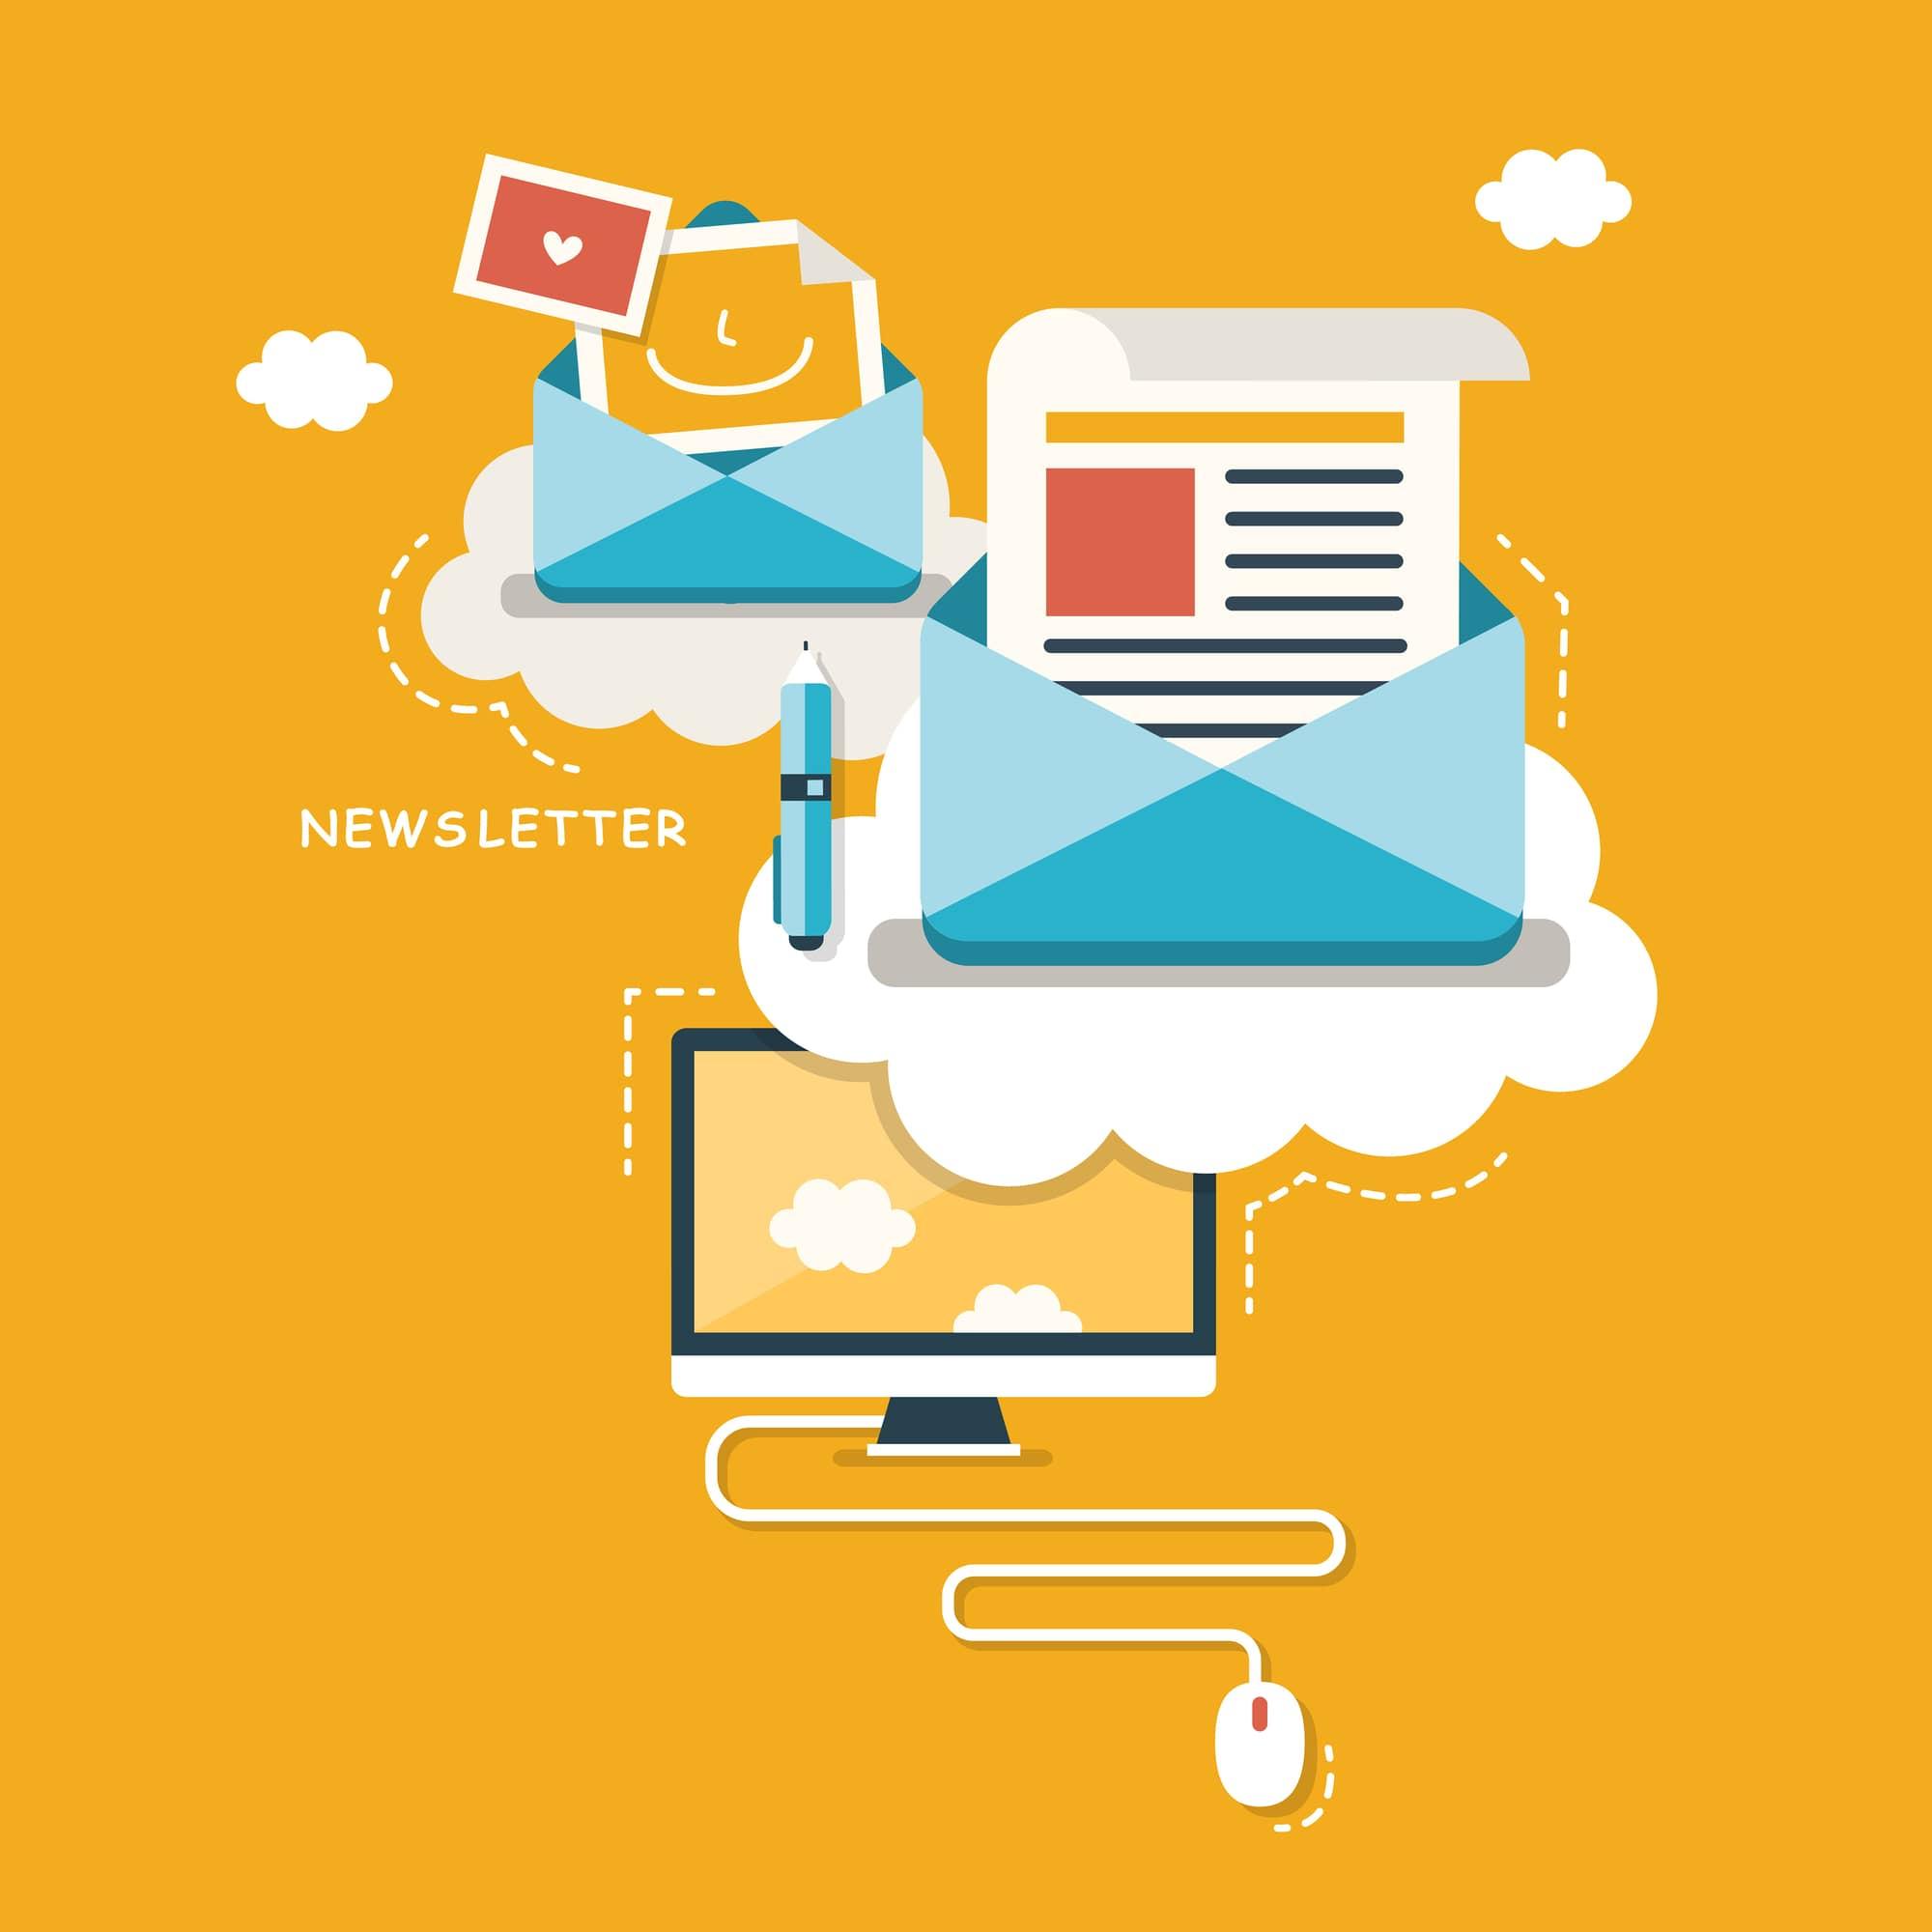 newsletter-tracking ds-gvo-konform